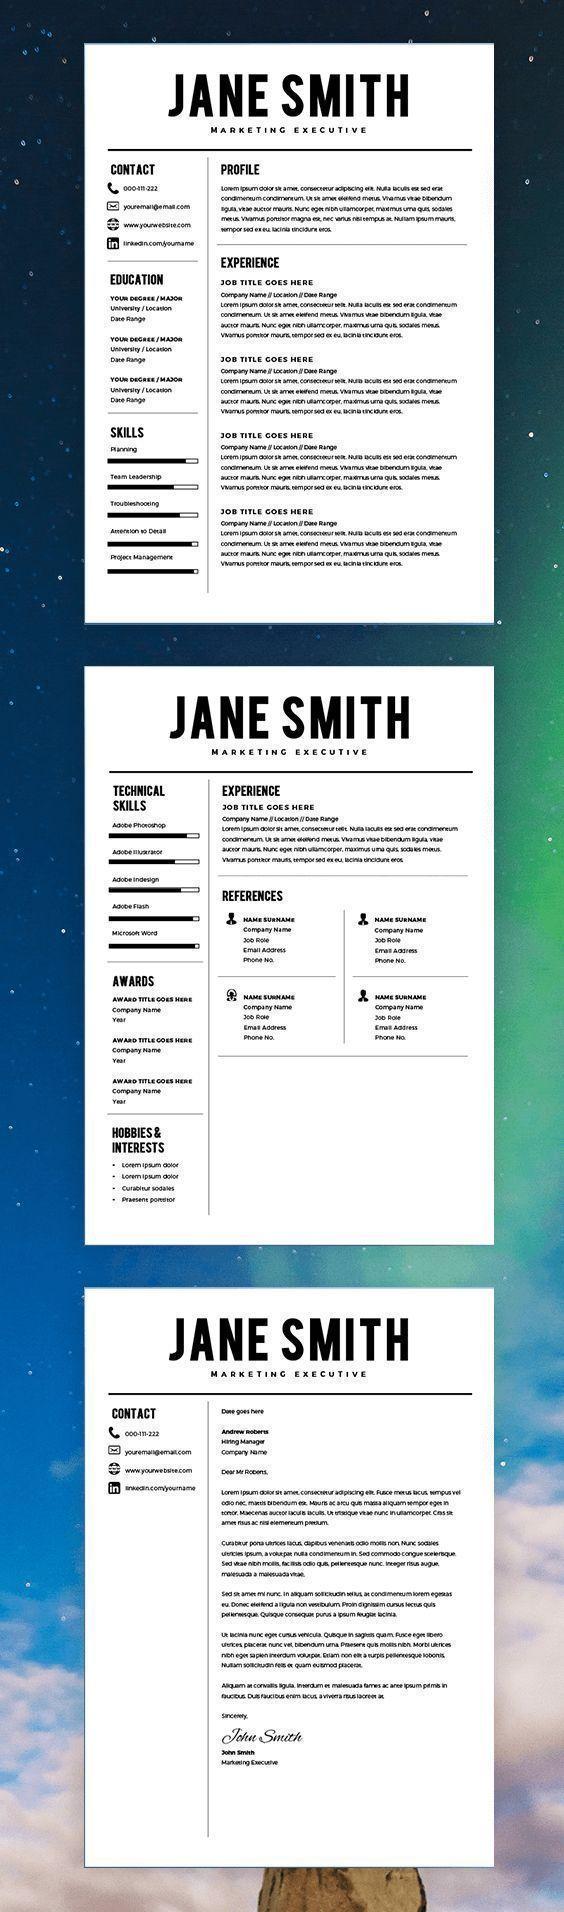 Microsoft Word Resume Template For Mac Best Resume Template  Cv Template  Cover Letter  Ms Word On Mac .